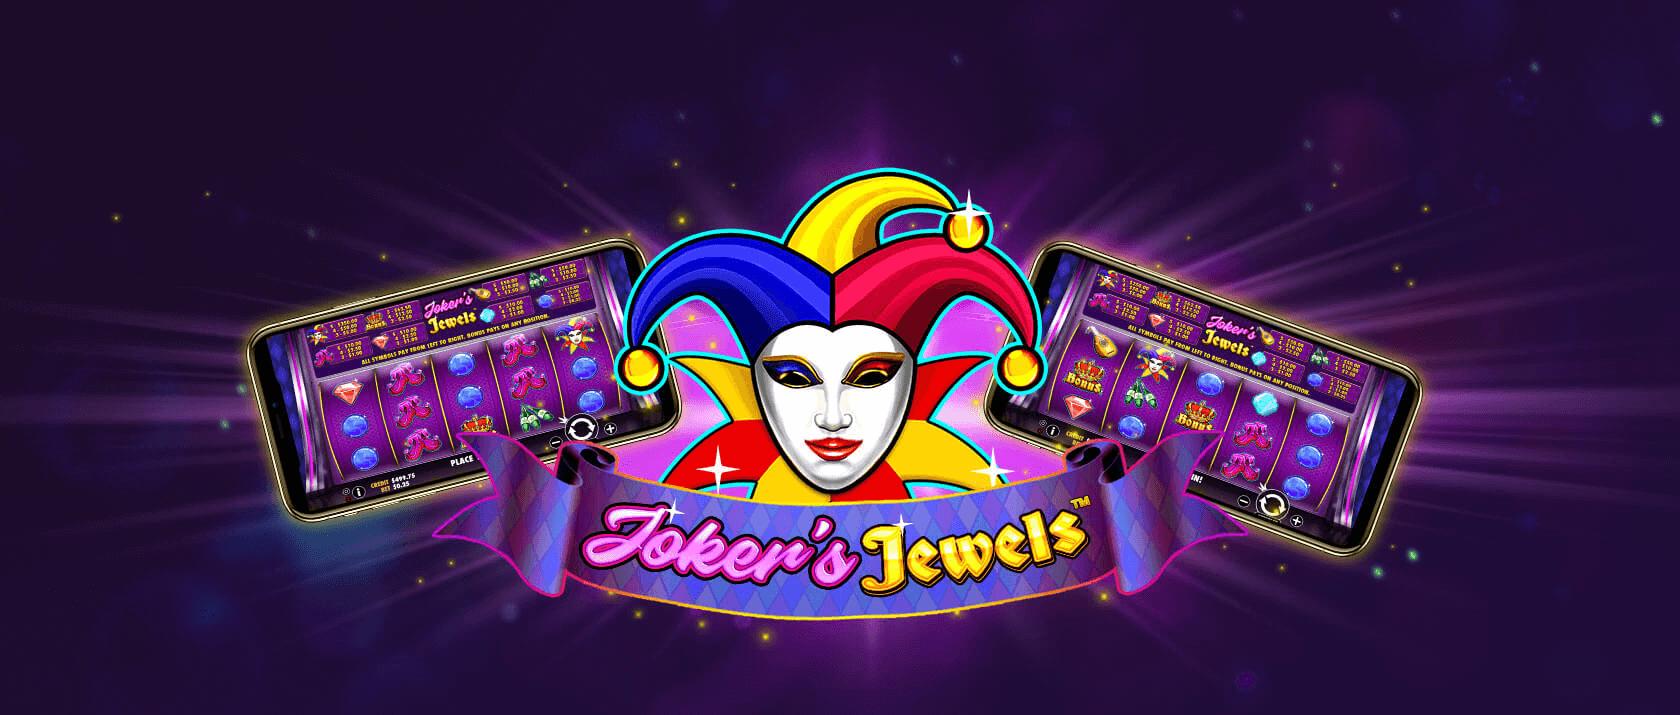 Joker'S Jewels slot: Play with $210 Free Bonus! | YummySpins